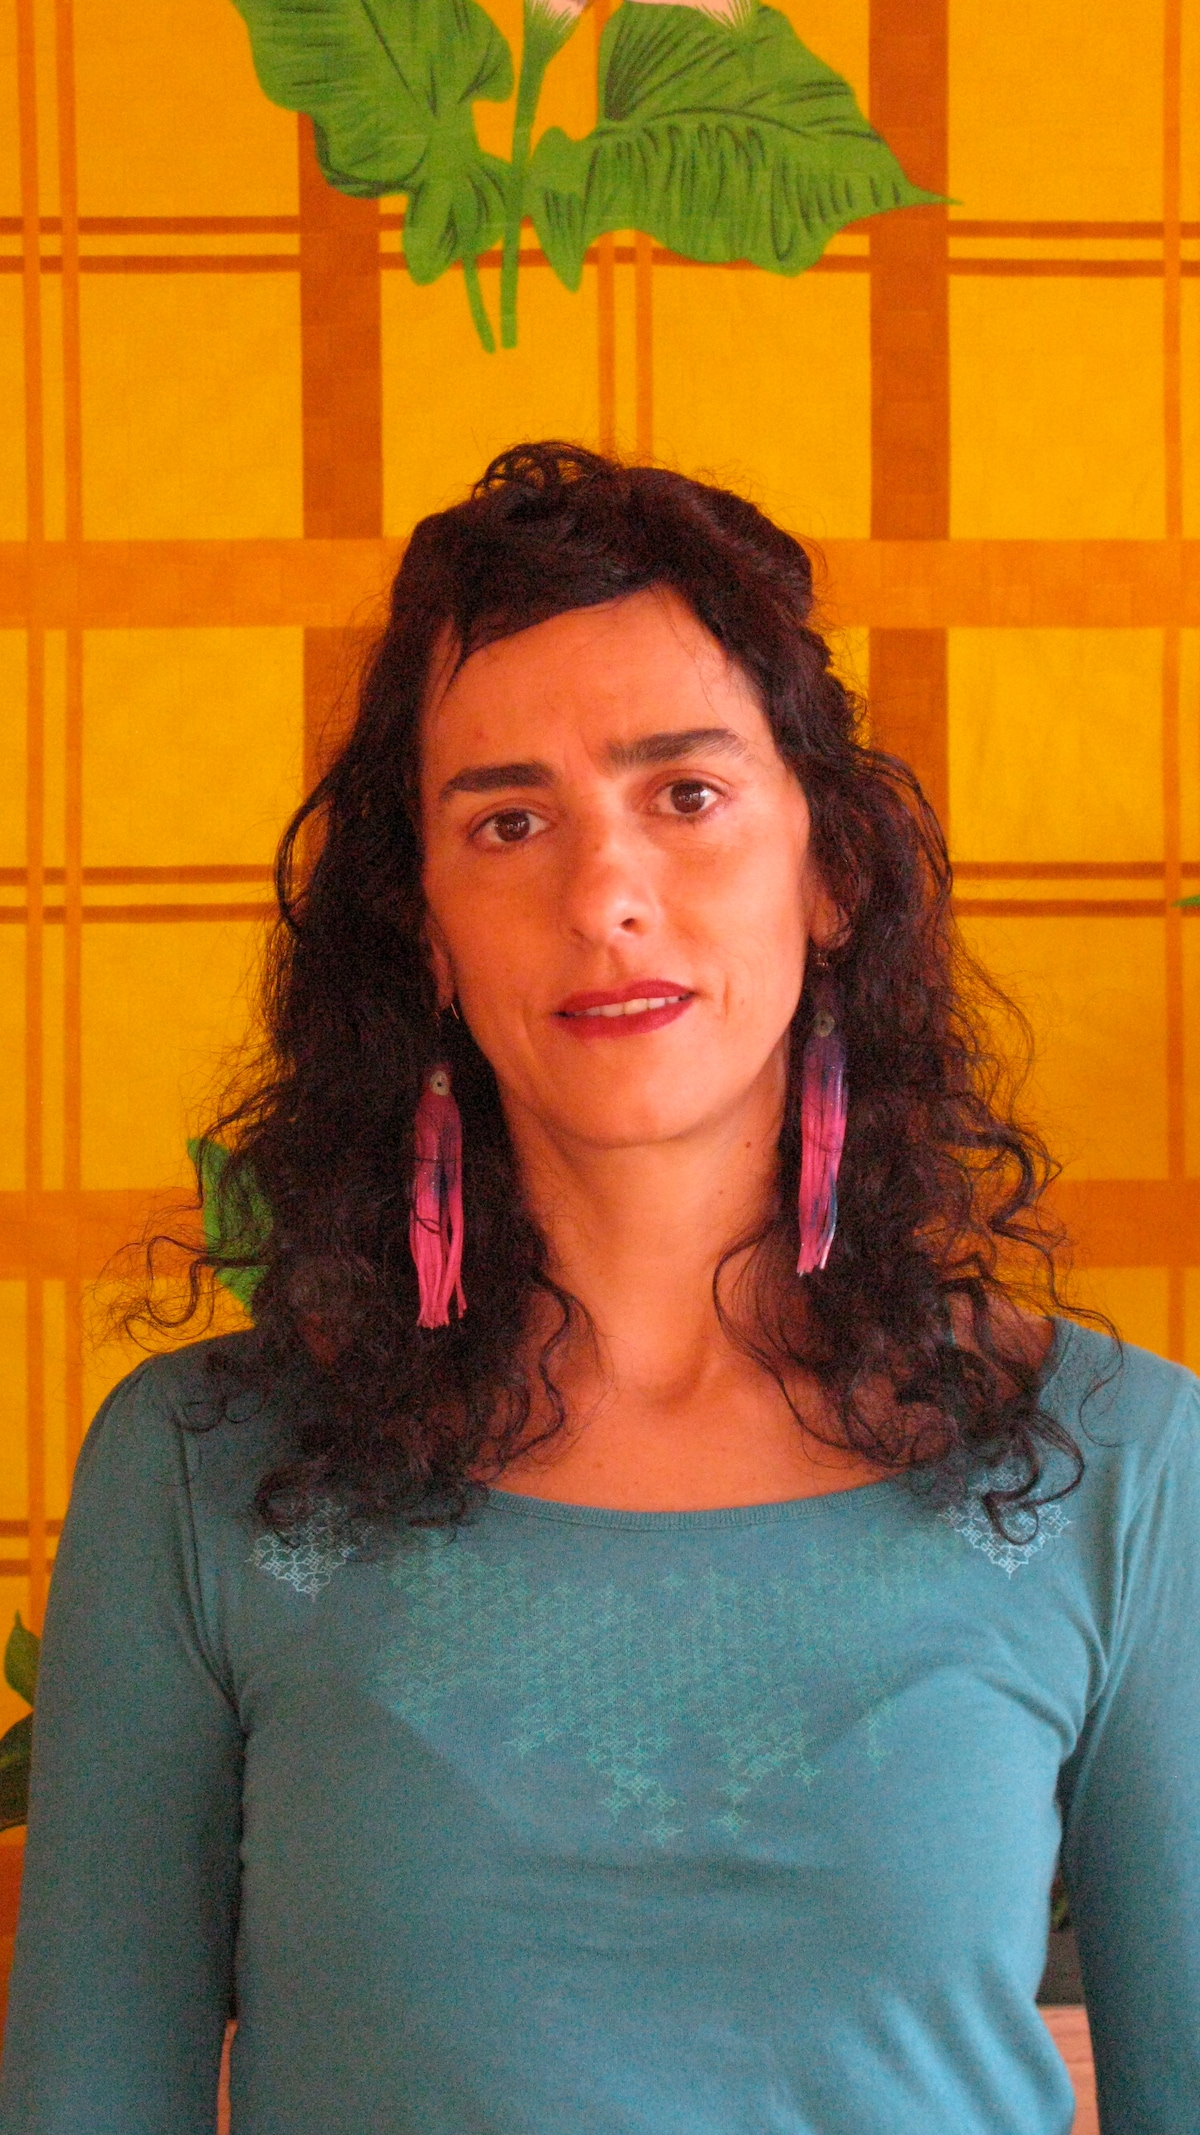 Lorena from Sayulita